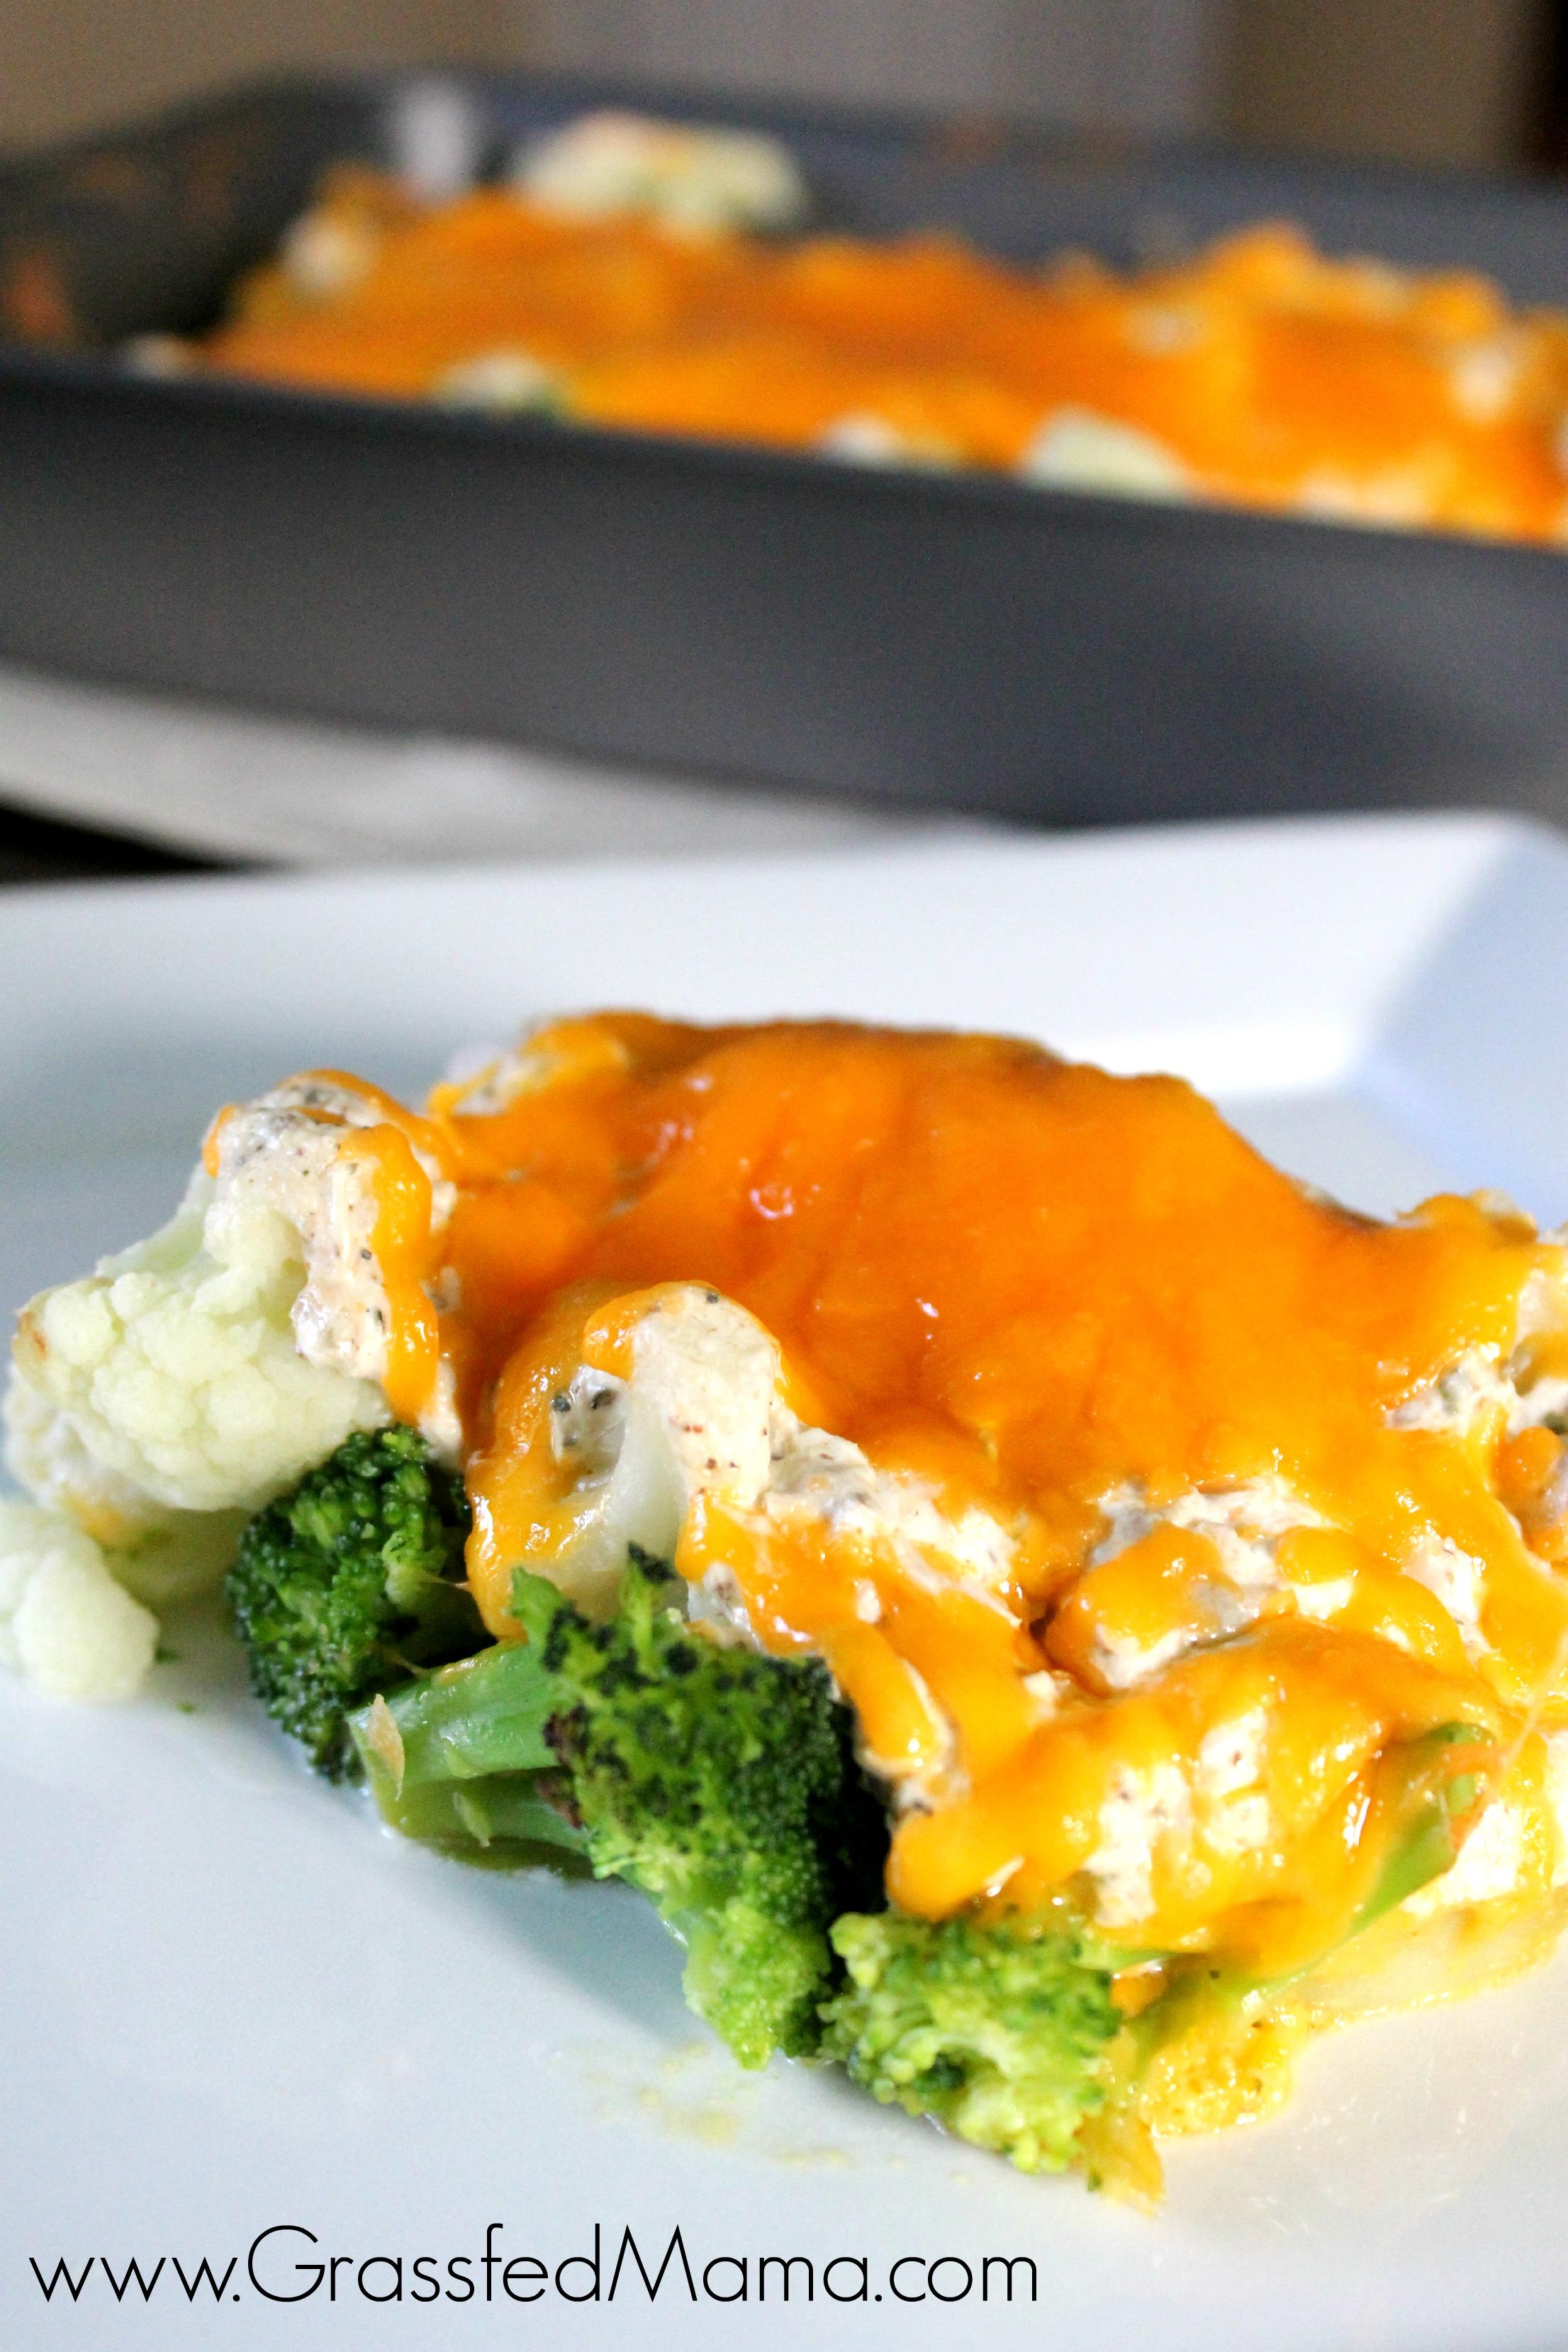 Low carb broccoli tuna casserole bake grassfed mama for Carbs in tuna fish